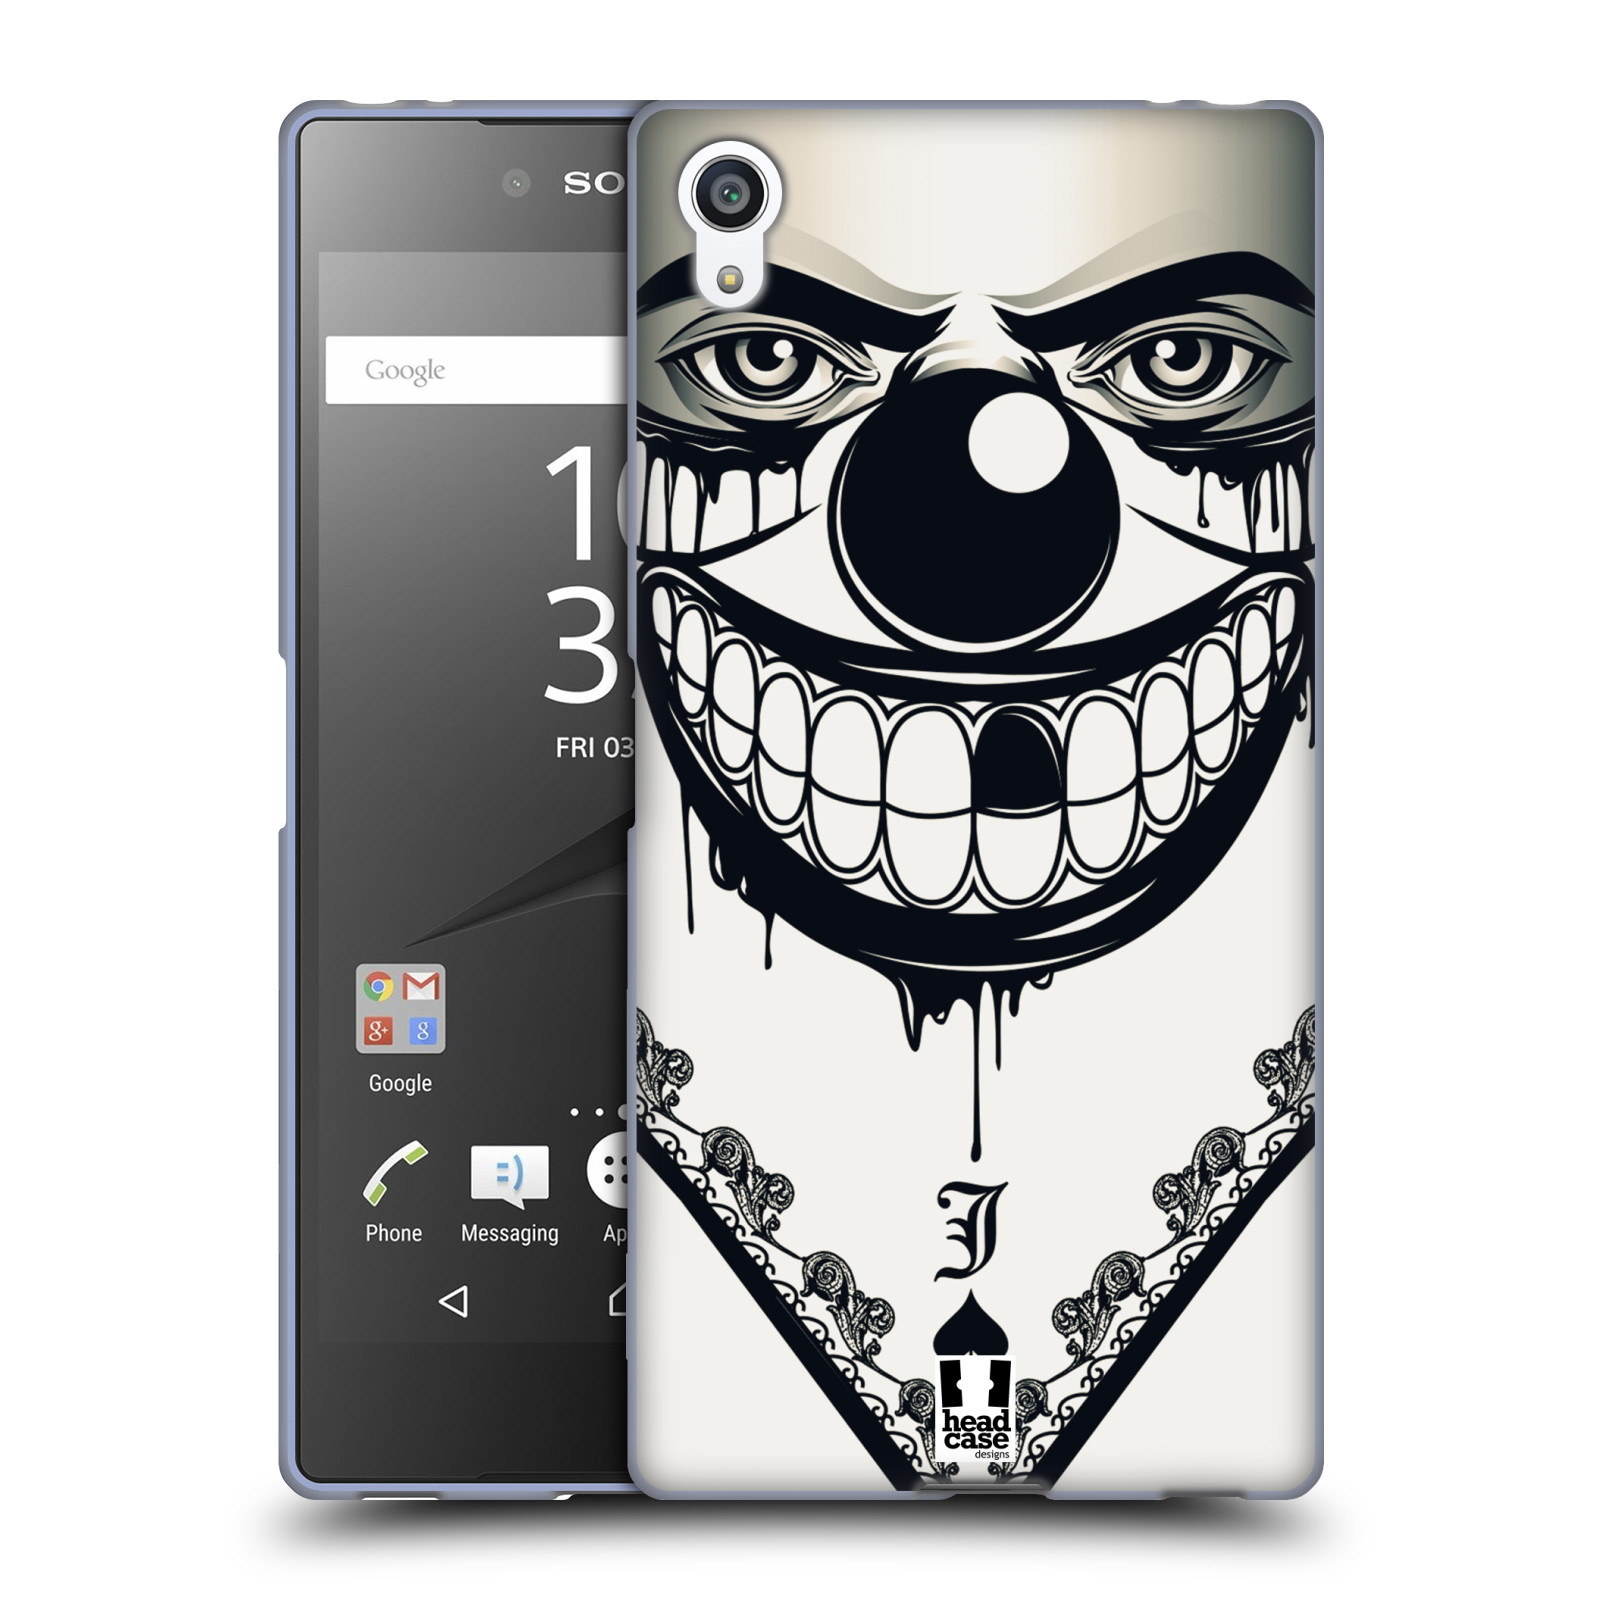 Silikonové pouzdro na mobil Sony Xperia Z5 Premium HEAD CASE ZLEJ KLAUN